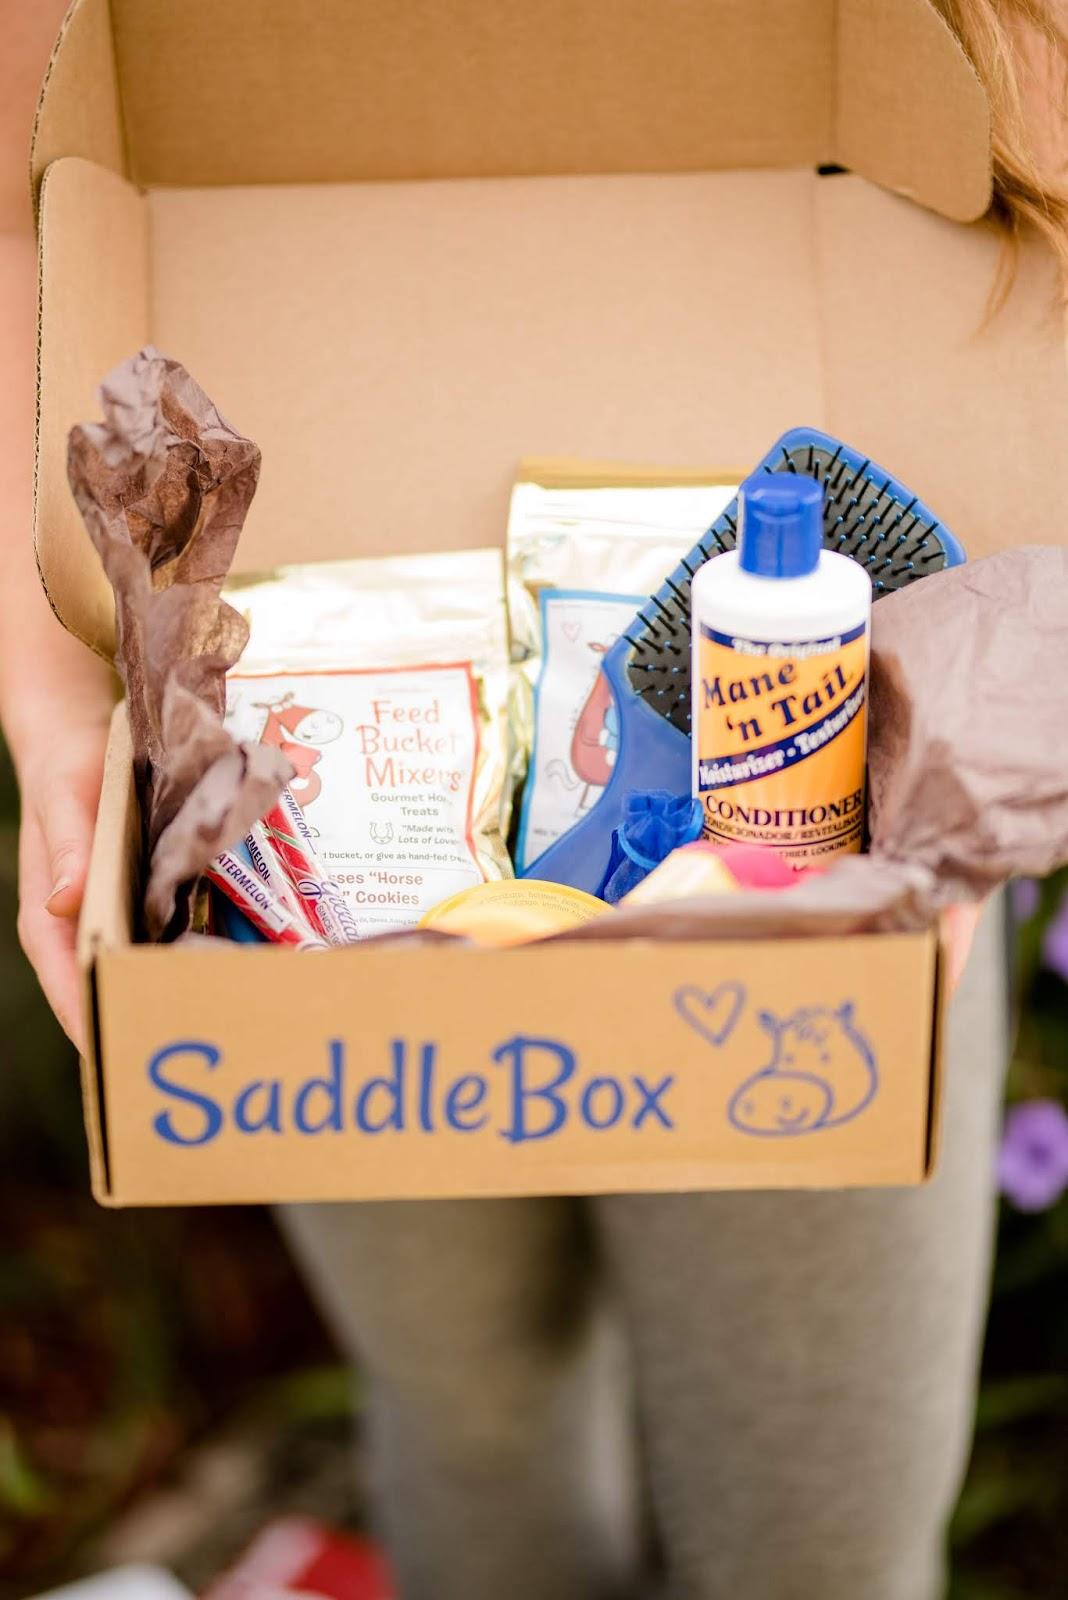 Saddlebox horse subscription box items